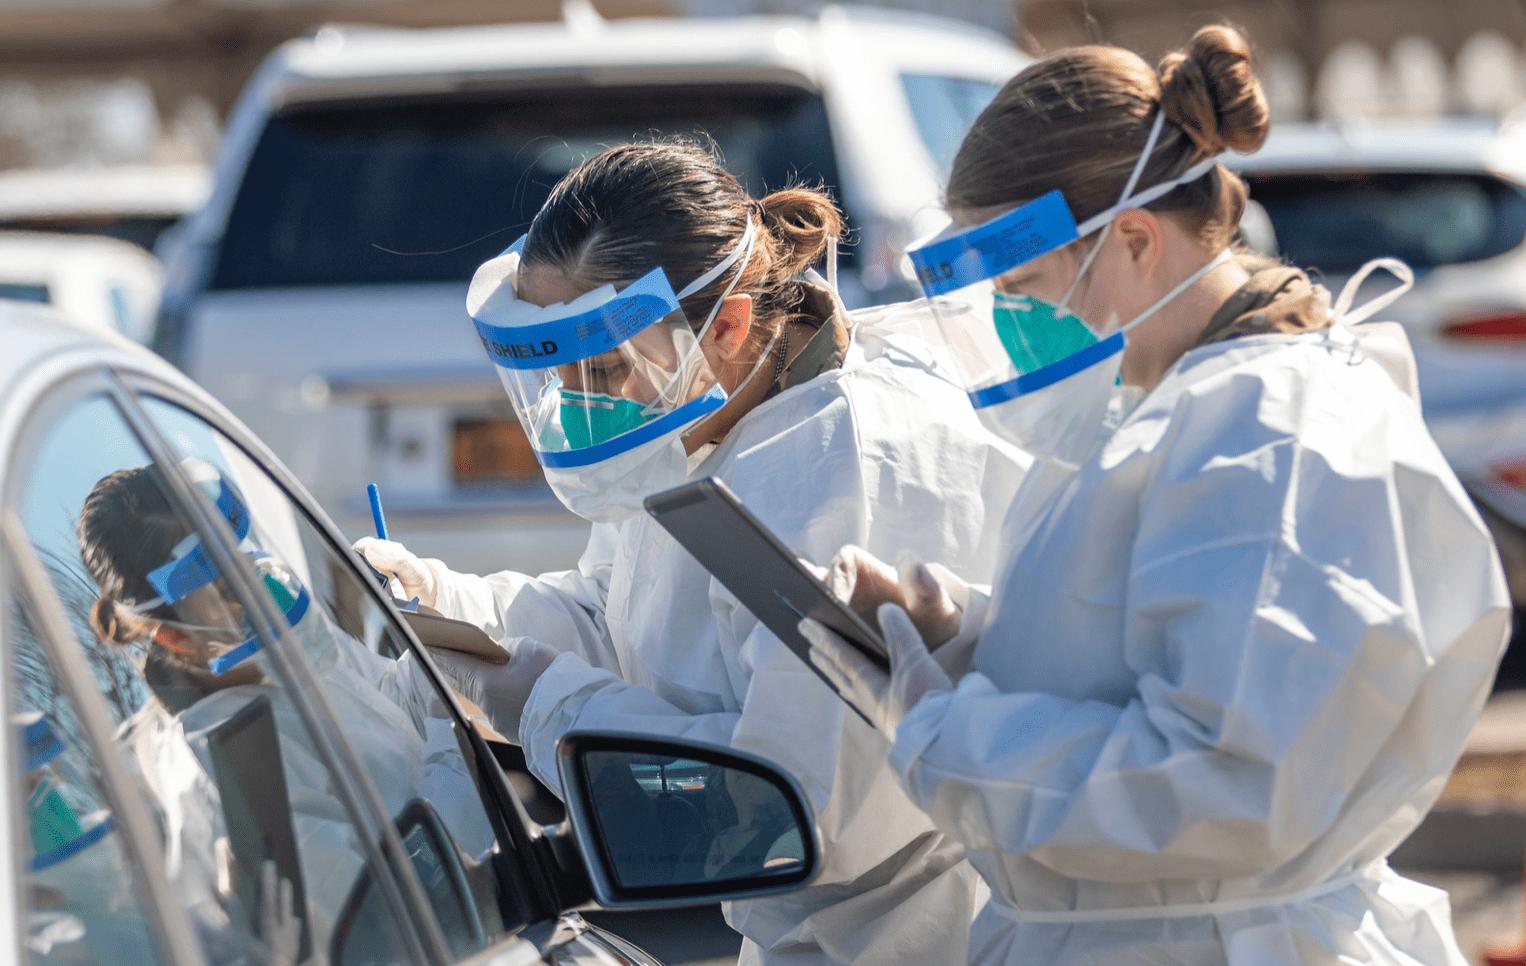 New York National Guard test mensen op besmetting met COVID-19.